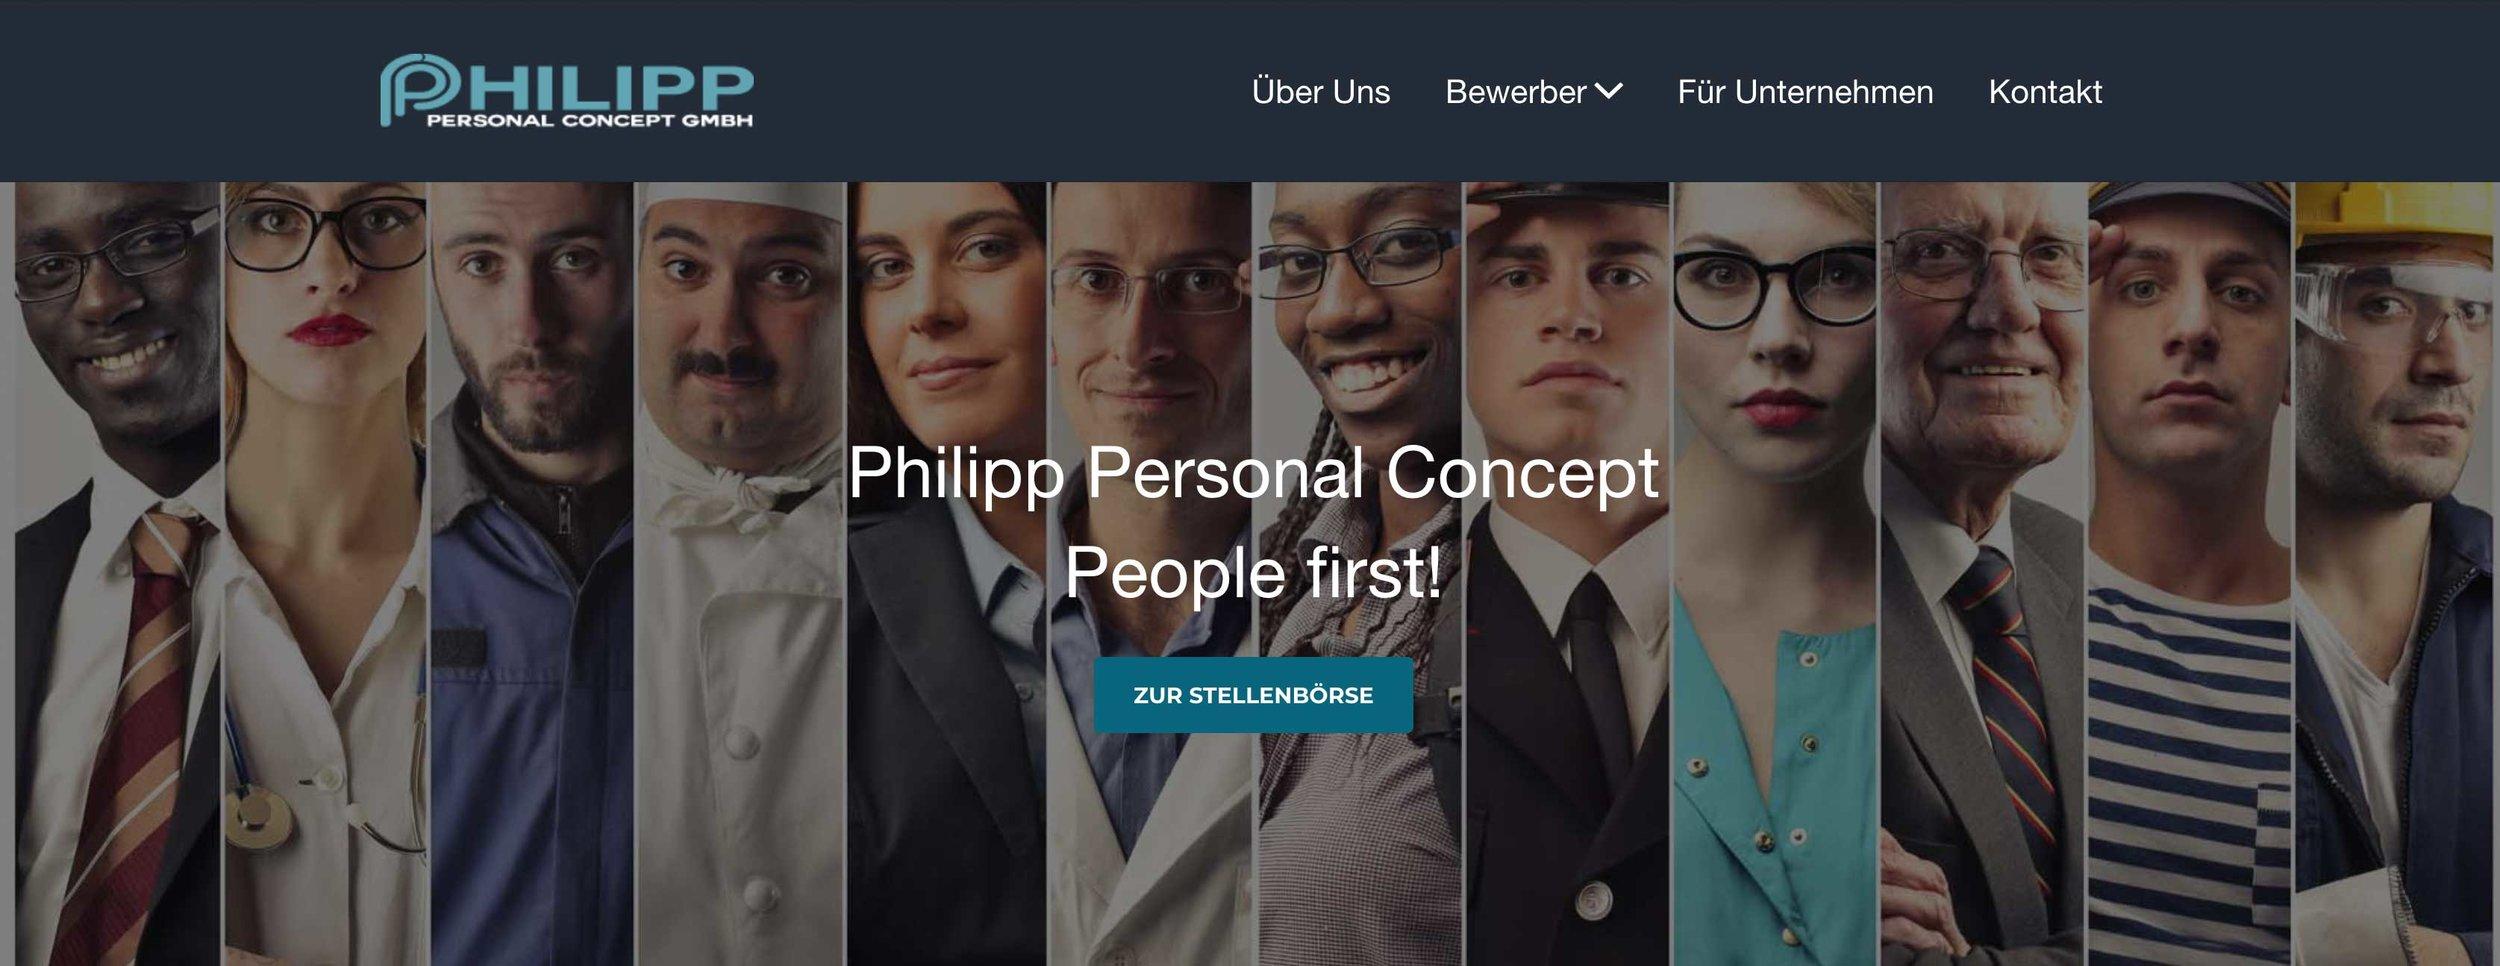 Philipp Personal Concept